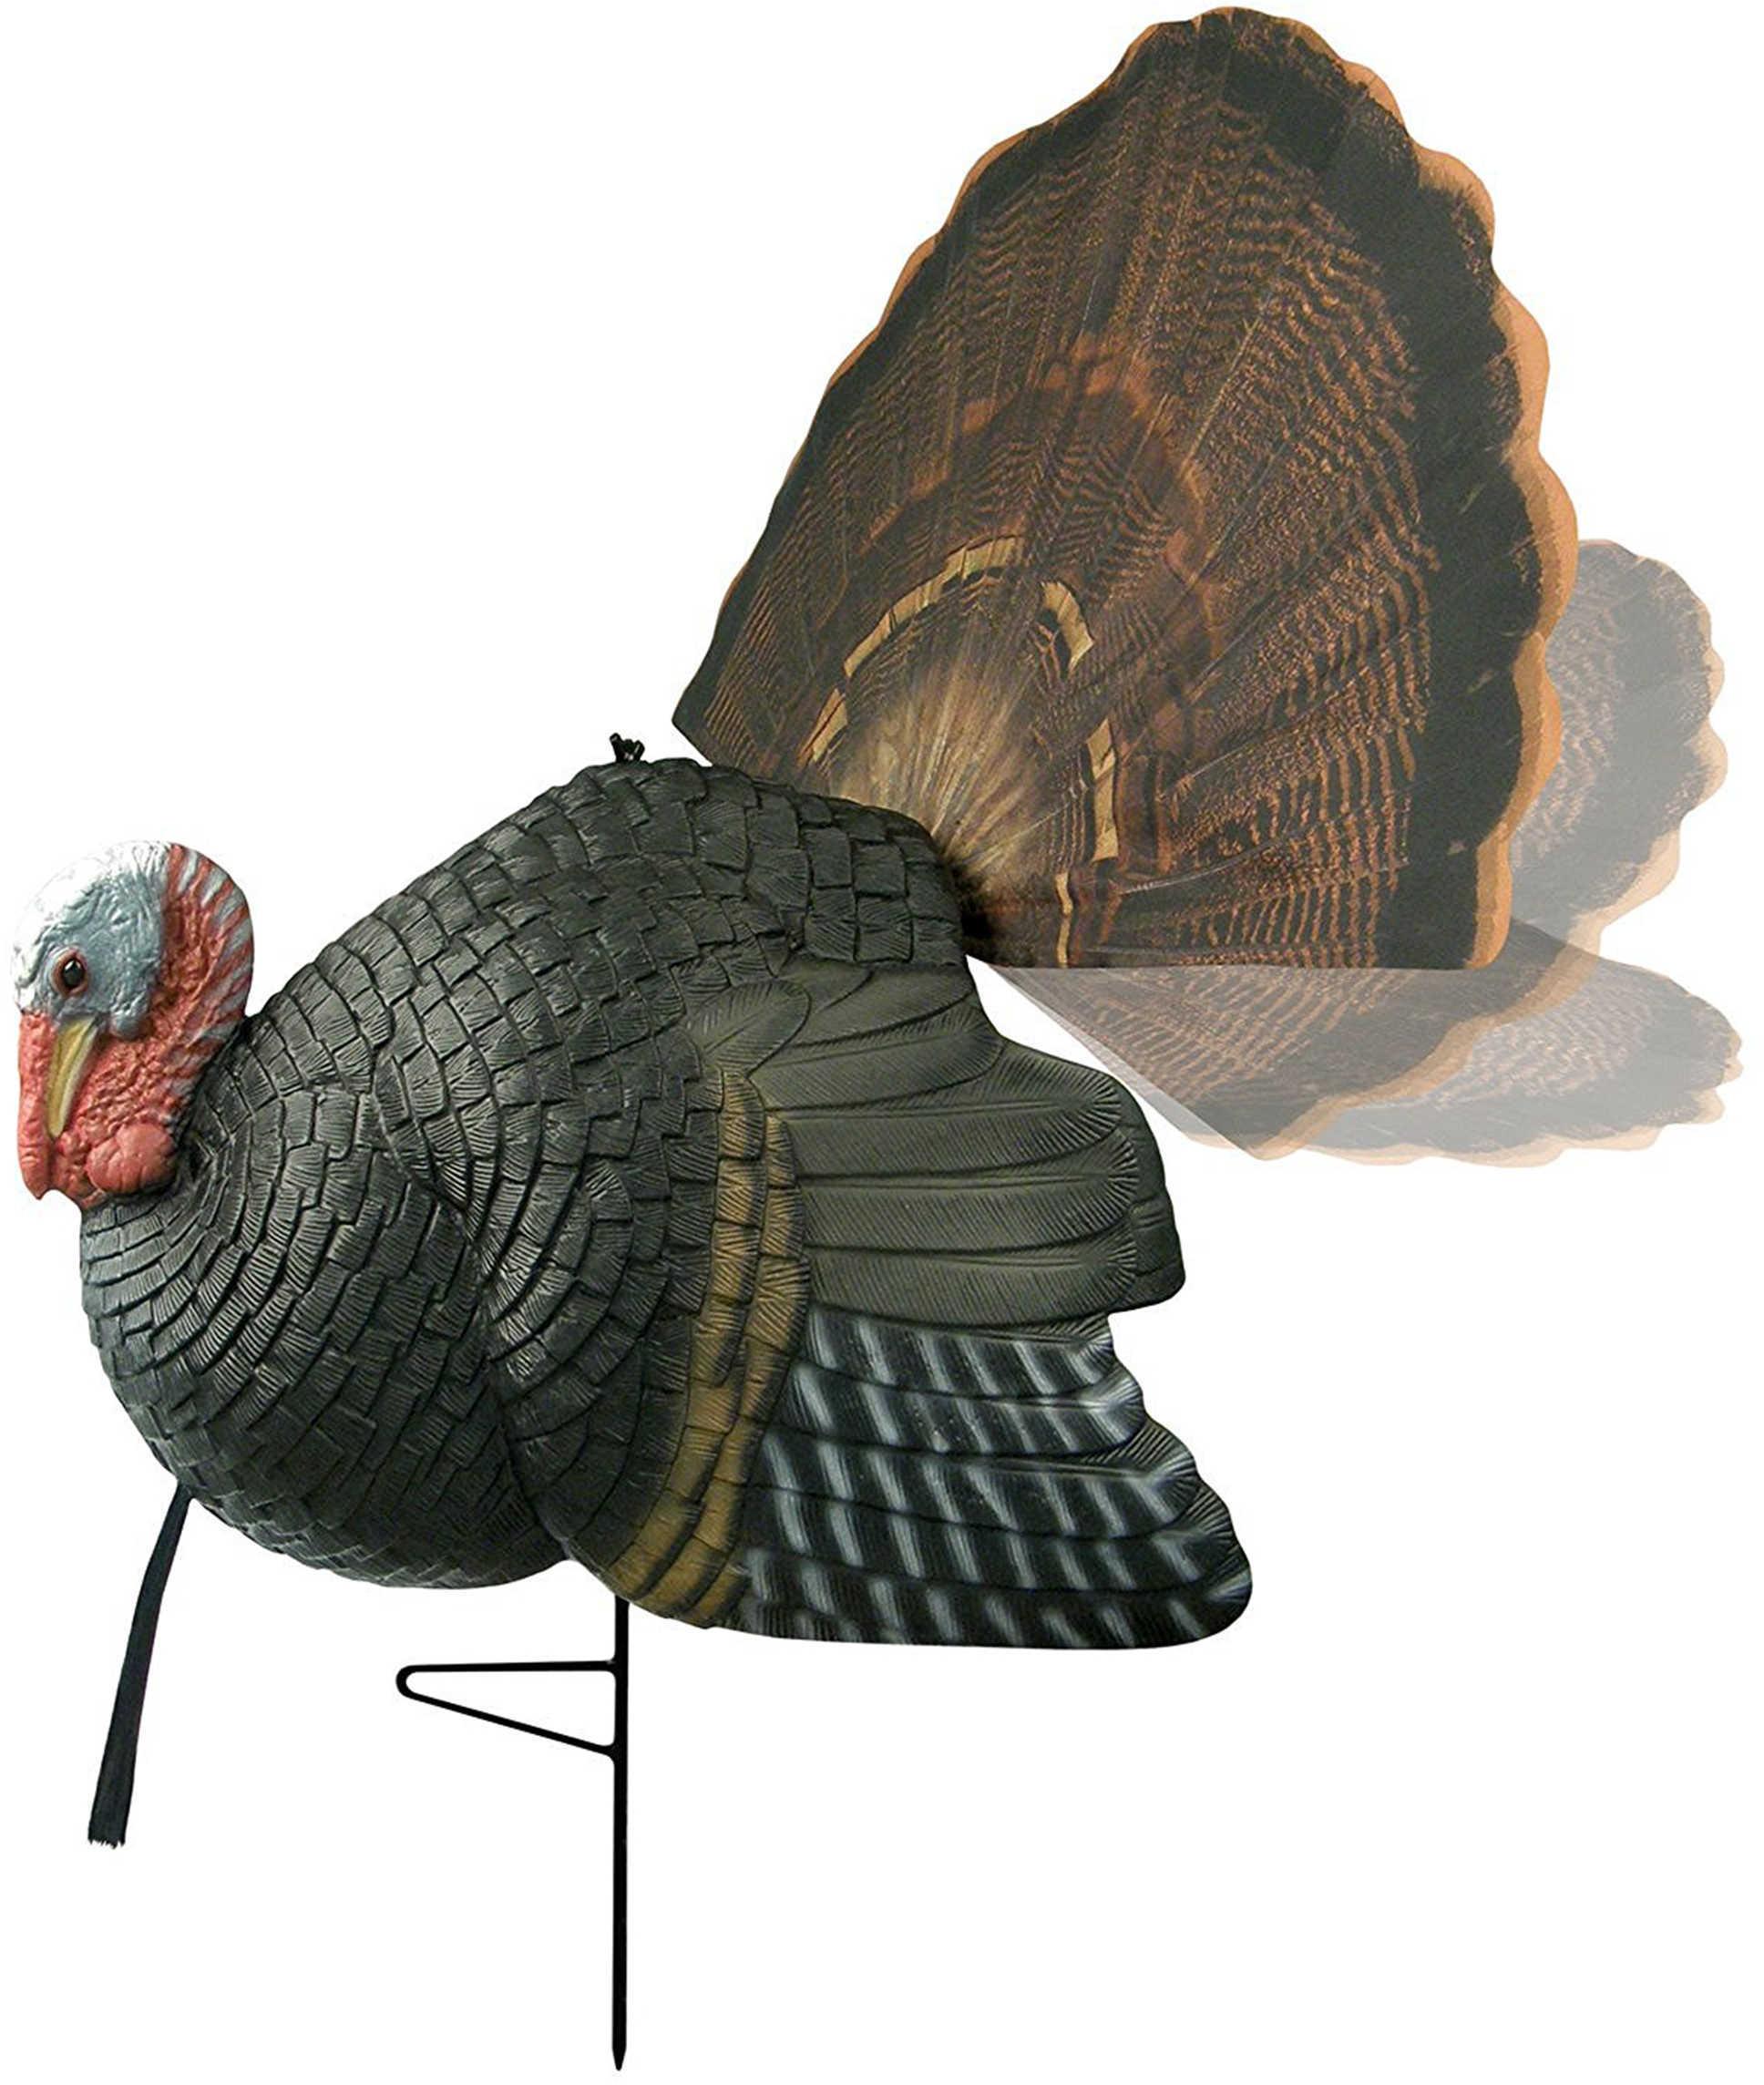 Primos Killer B Turkey Decoy Model: 69021